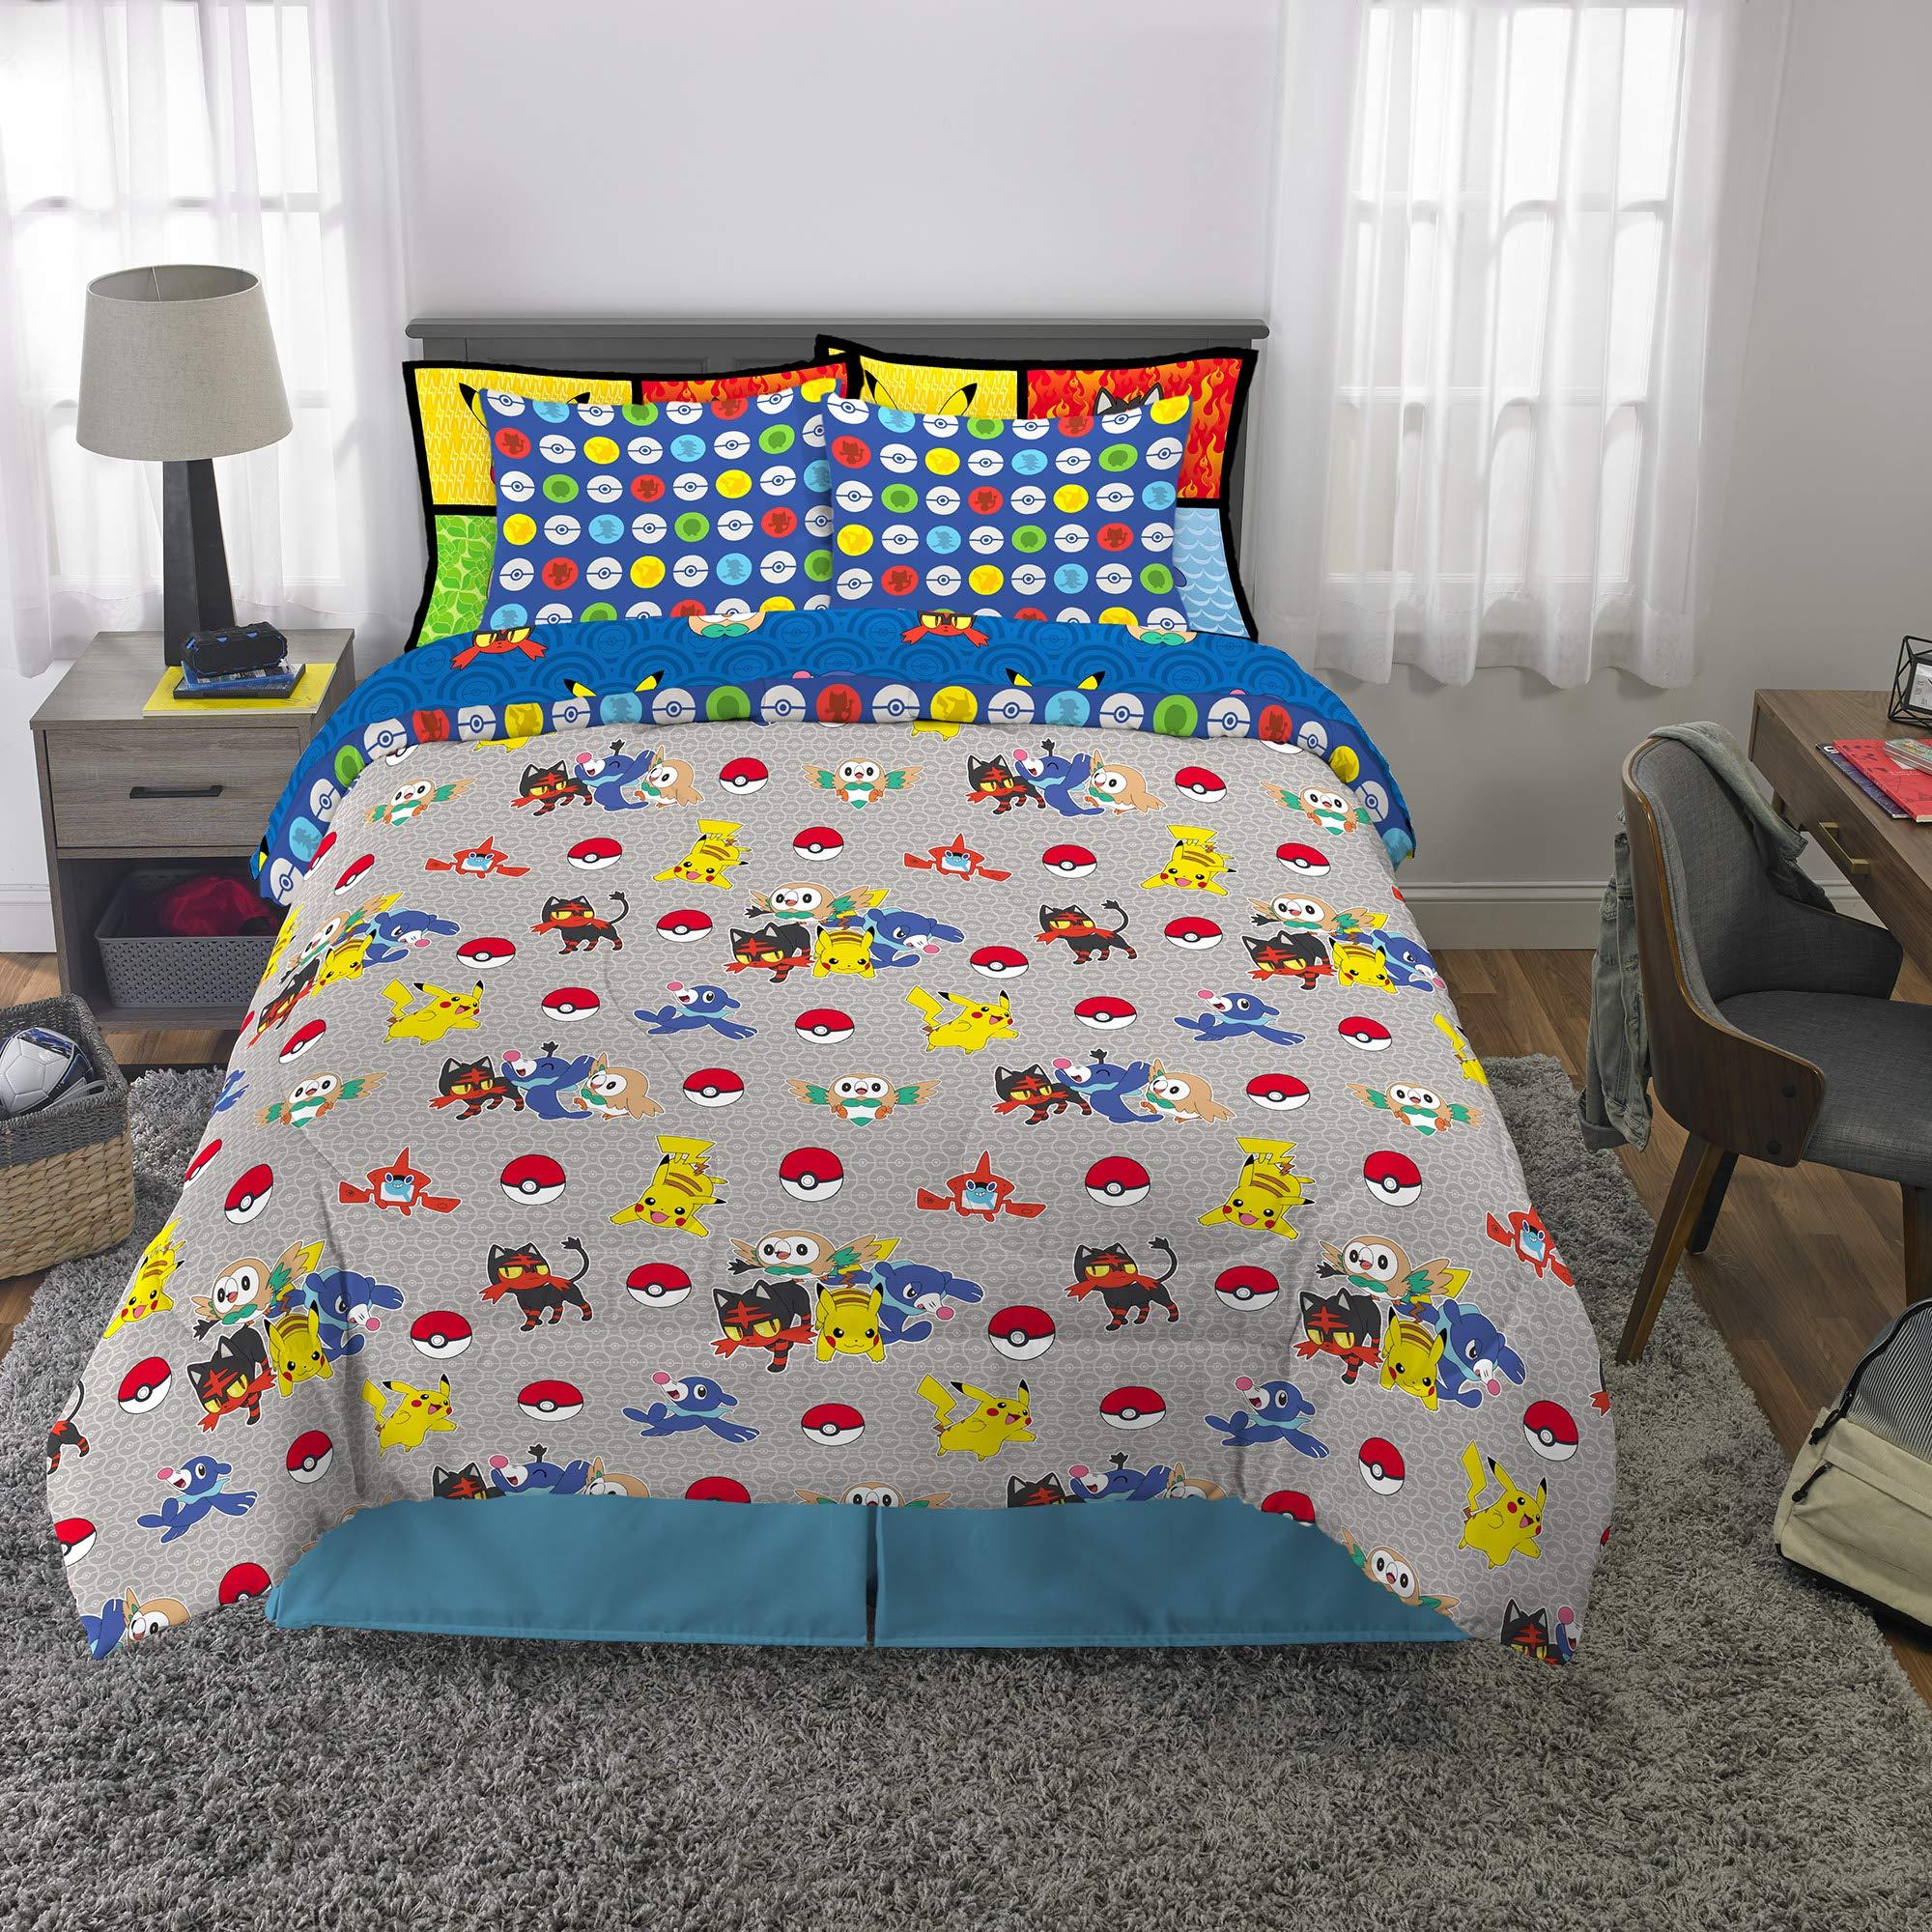 Franco Kids Bedding Super Soft Comforter and Sheet Set with Bonus Sham, 7 Piece Full Size, Pokemon by Franco